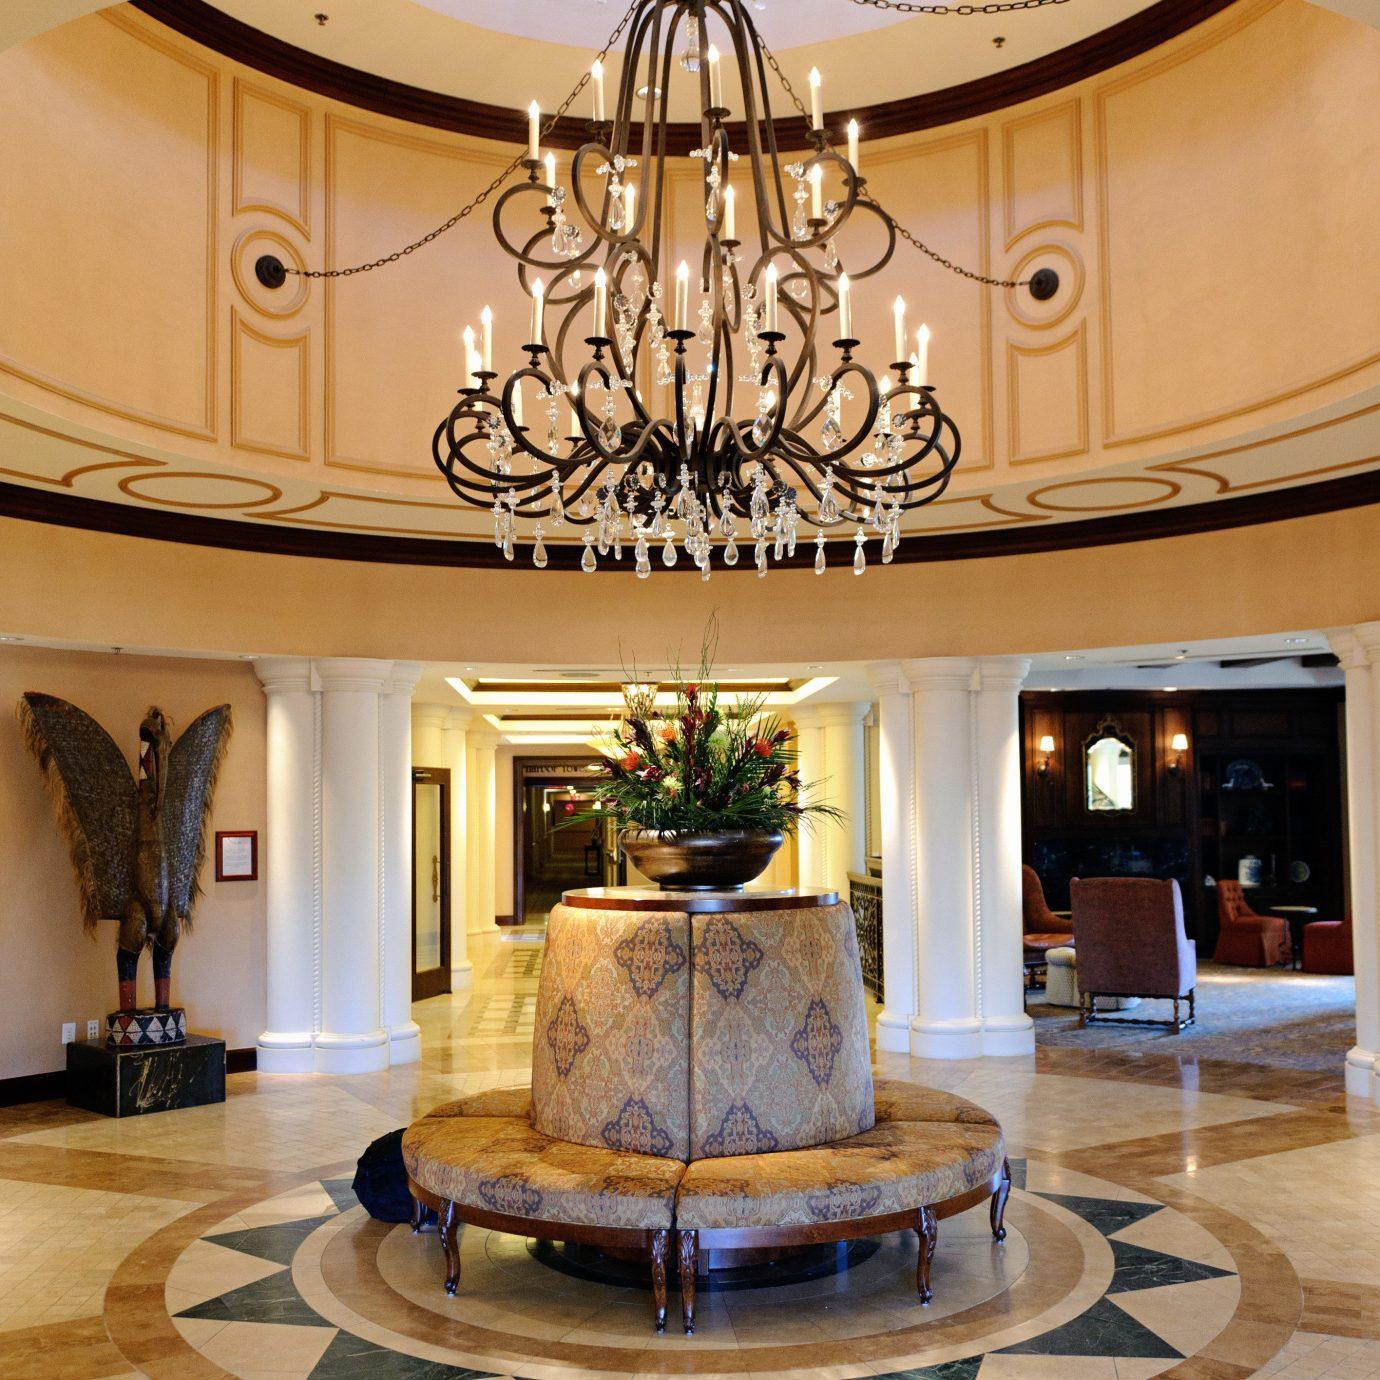 Inn Lobby Lounge Resort living room home hardwood lighting wood flooring Fireplace mansion cabinetry fancy